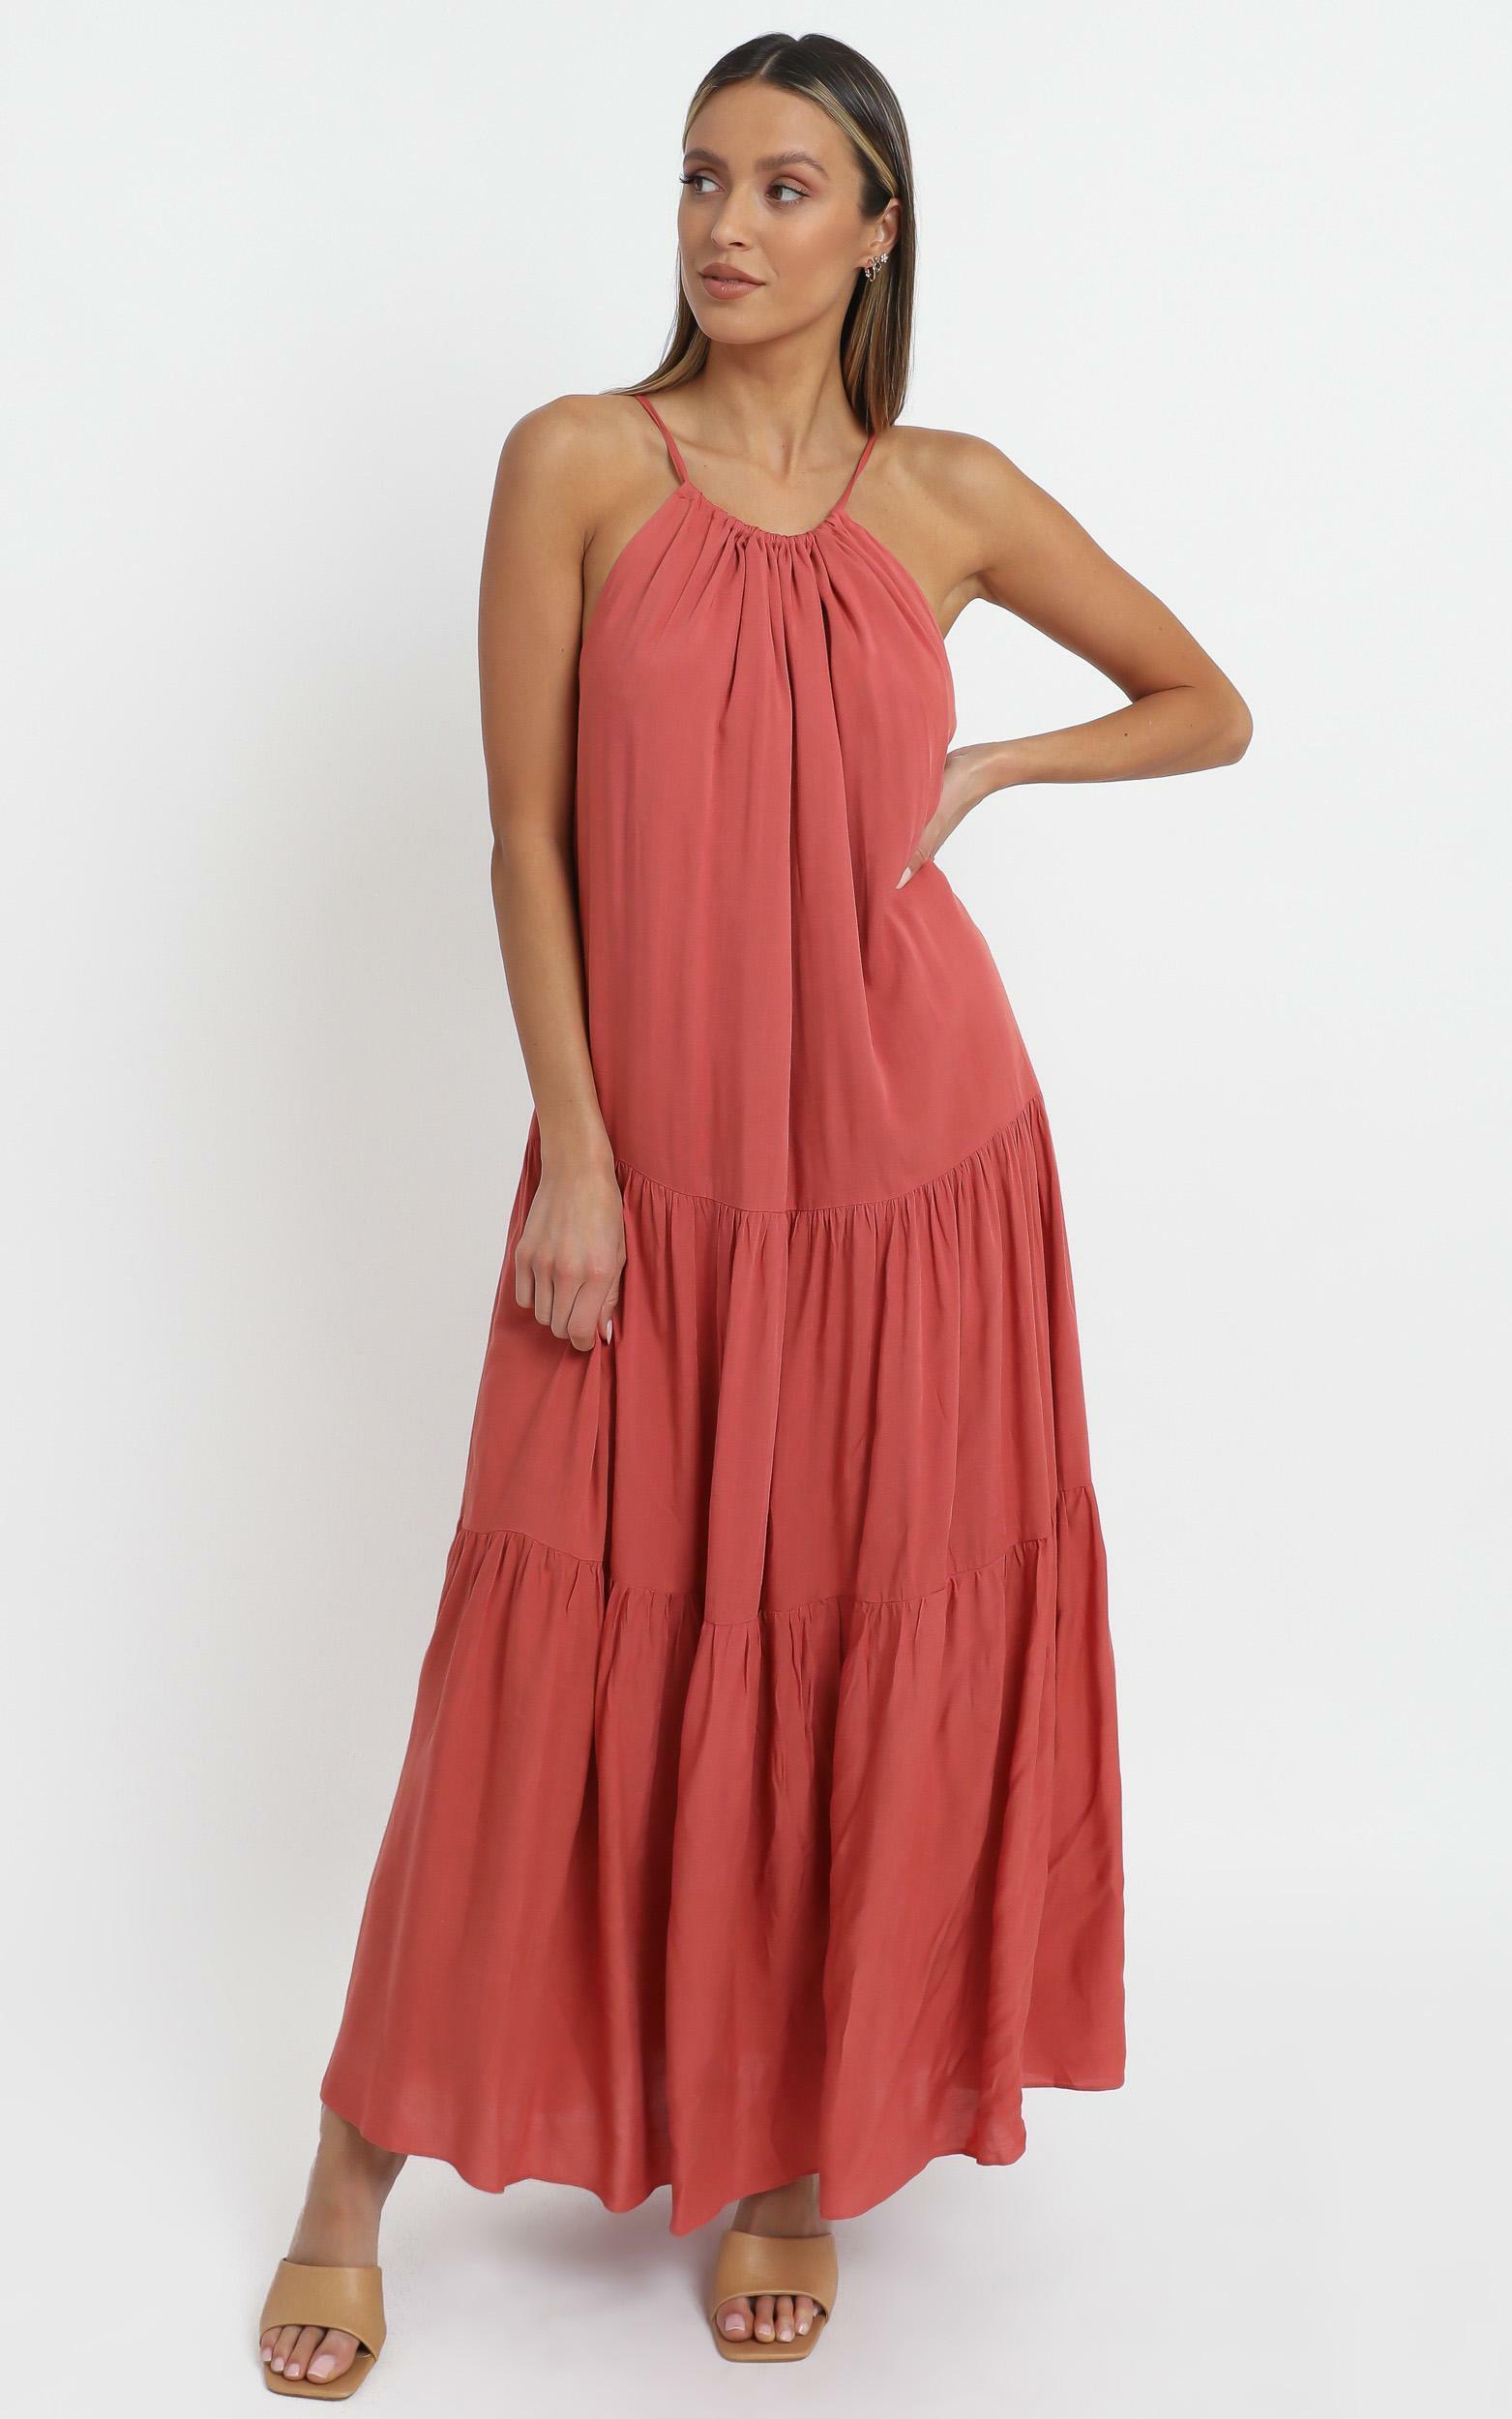 Pyper Dress in Rust - 14 (XL), Rust, hi-res image number null